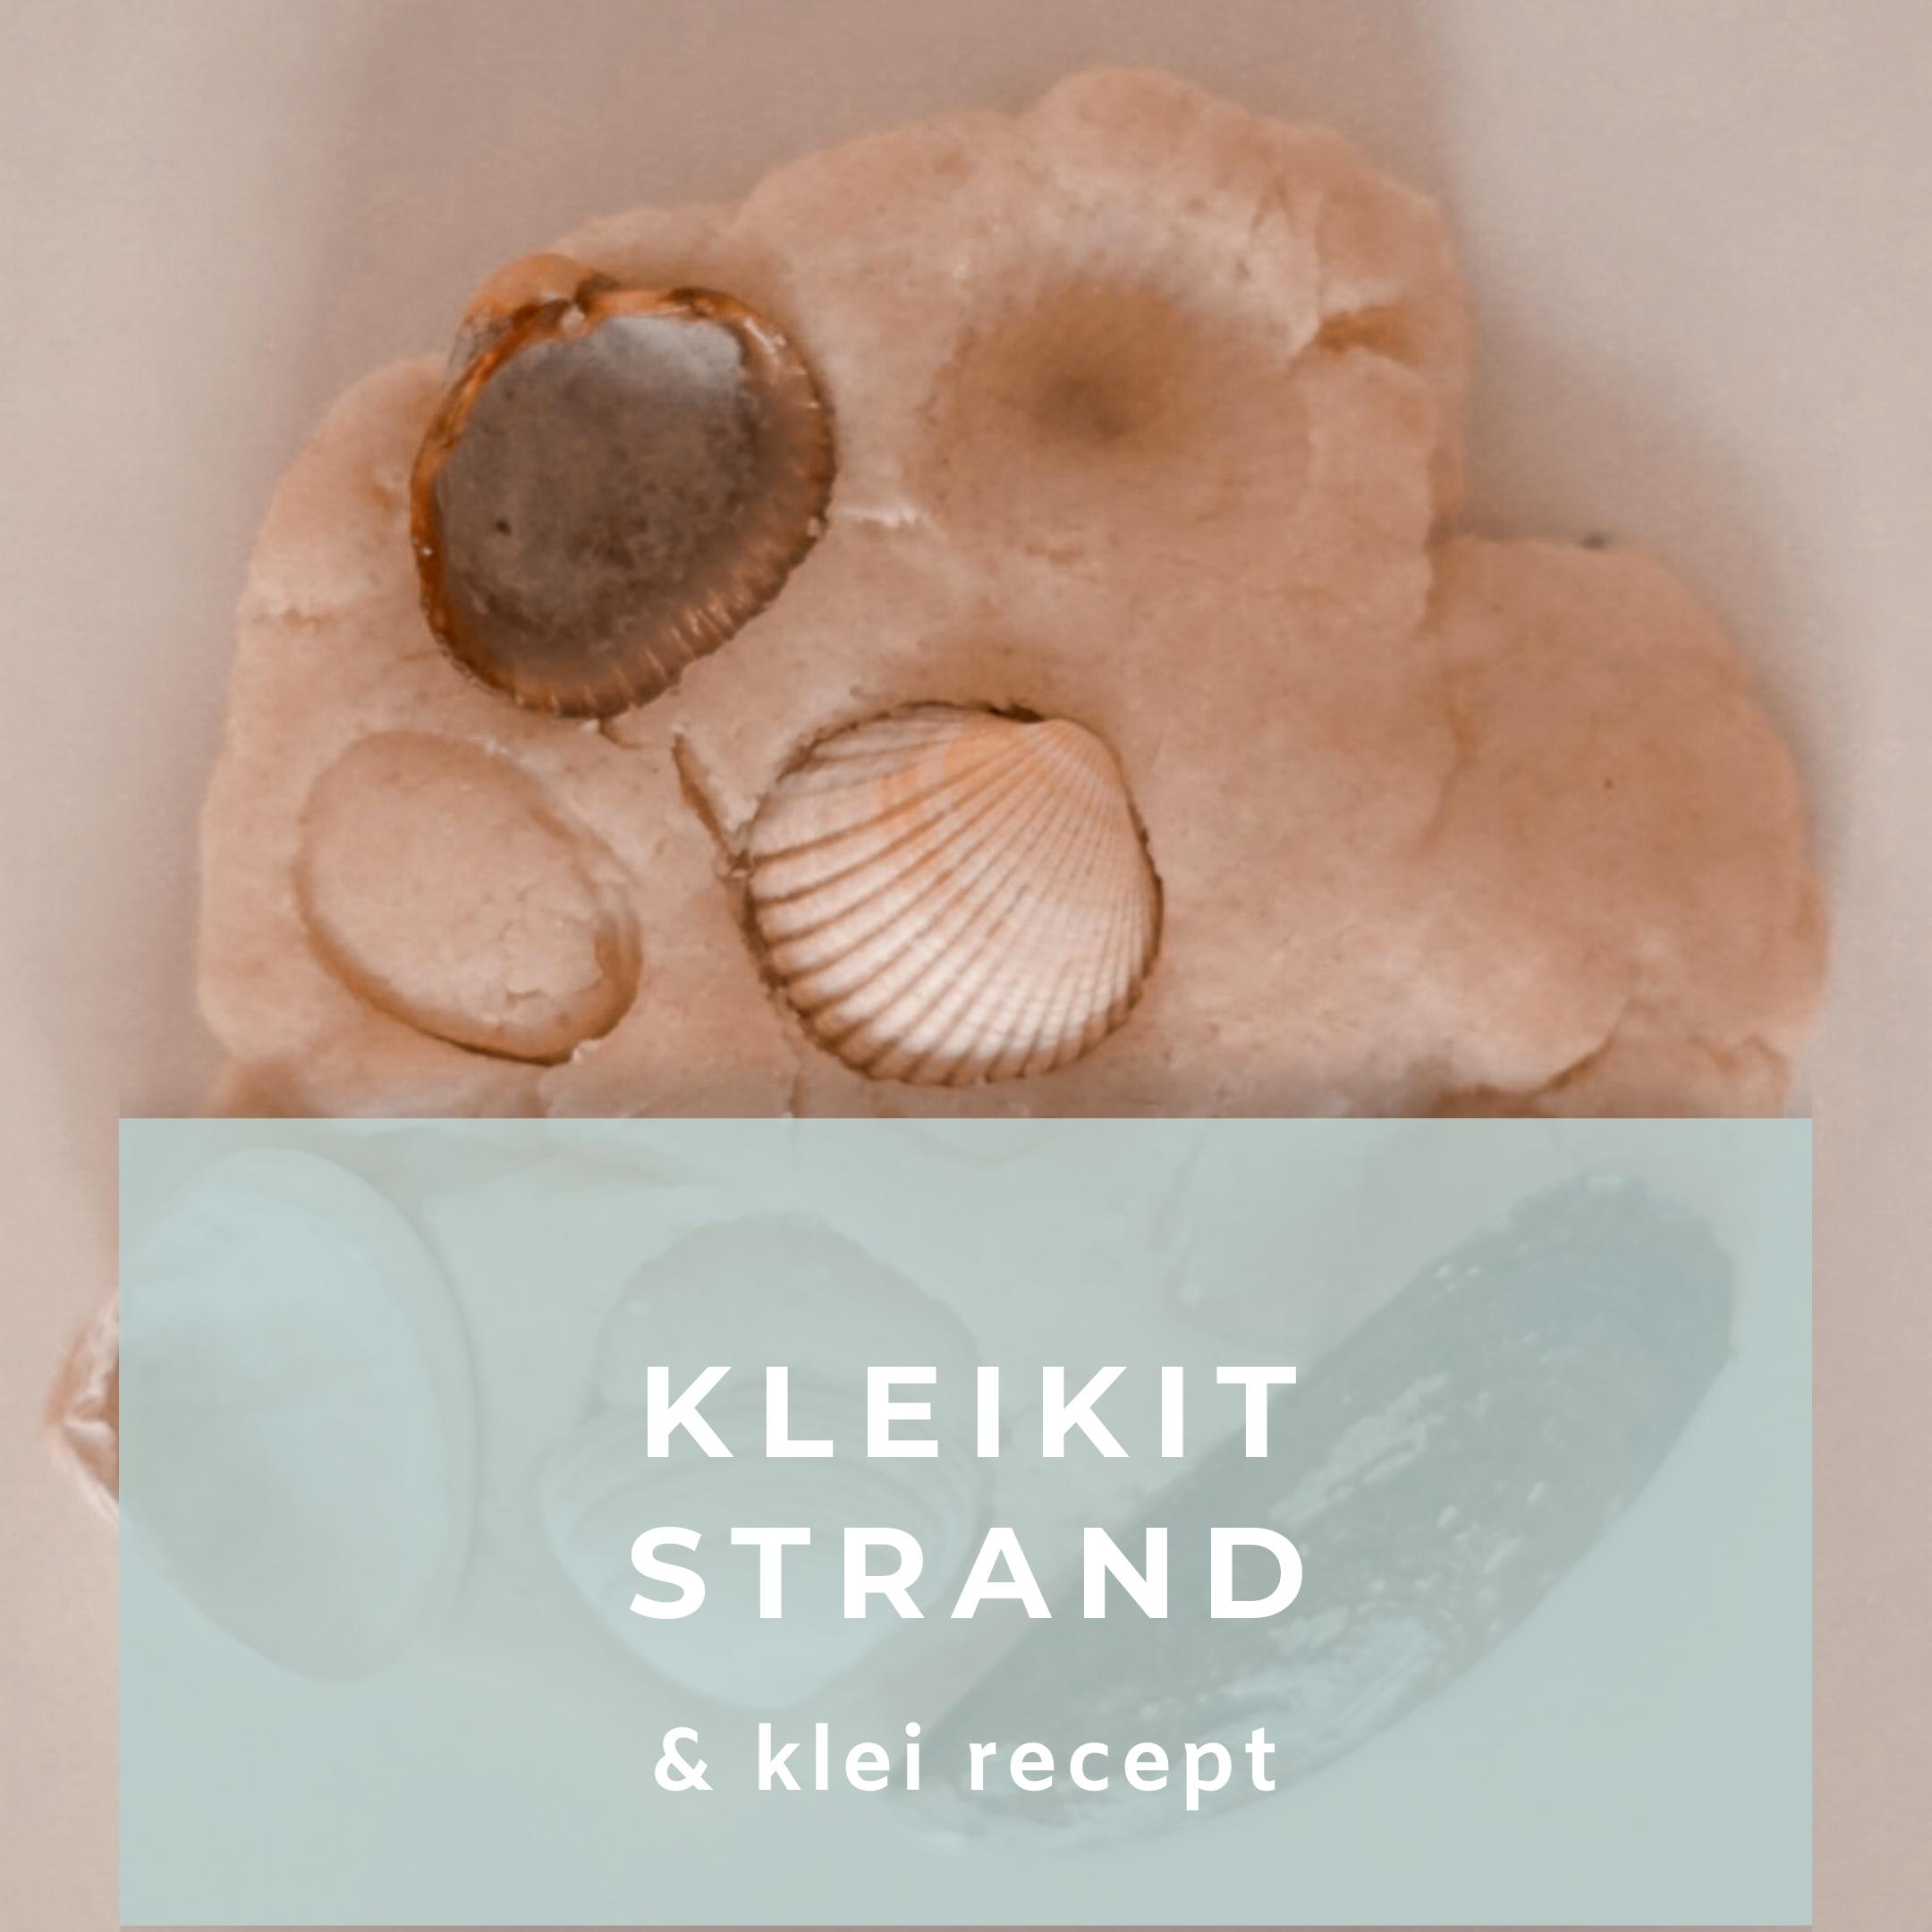 Kleikit strand inclusief klei recept